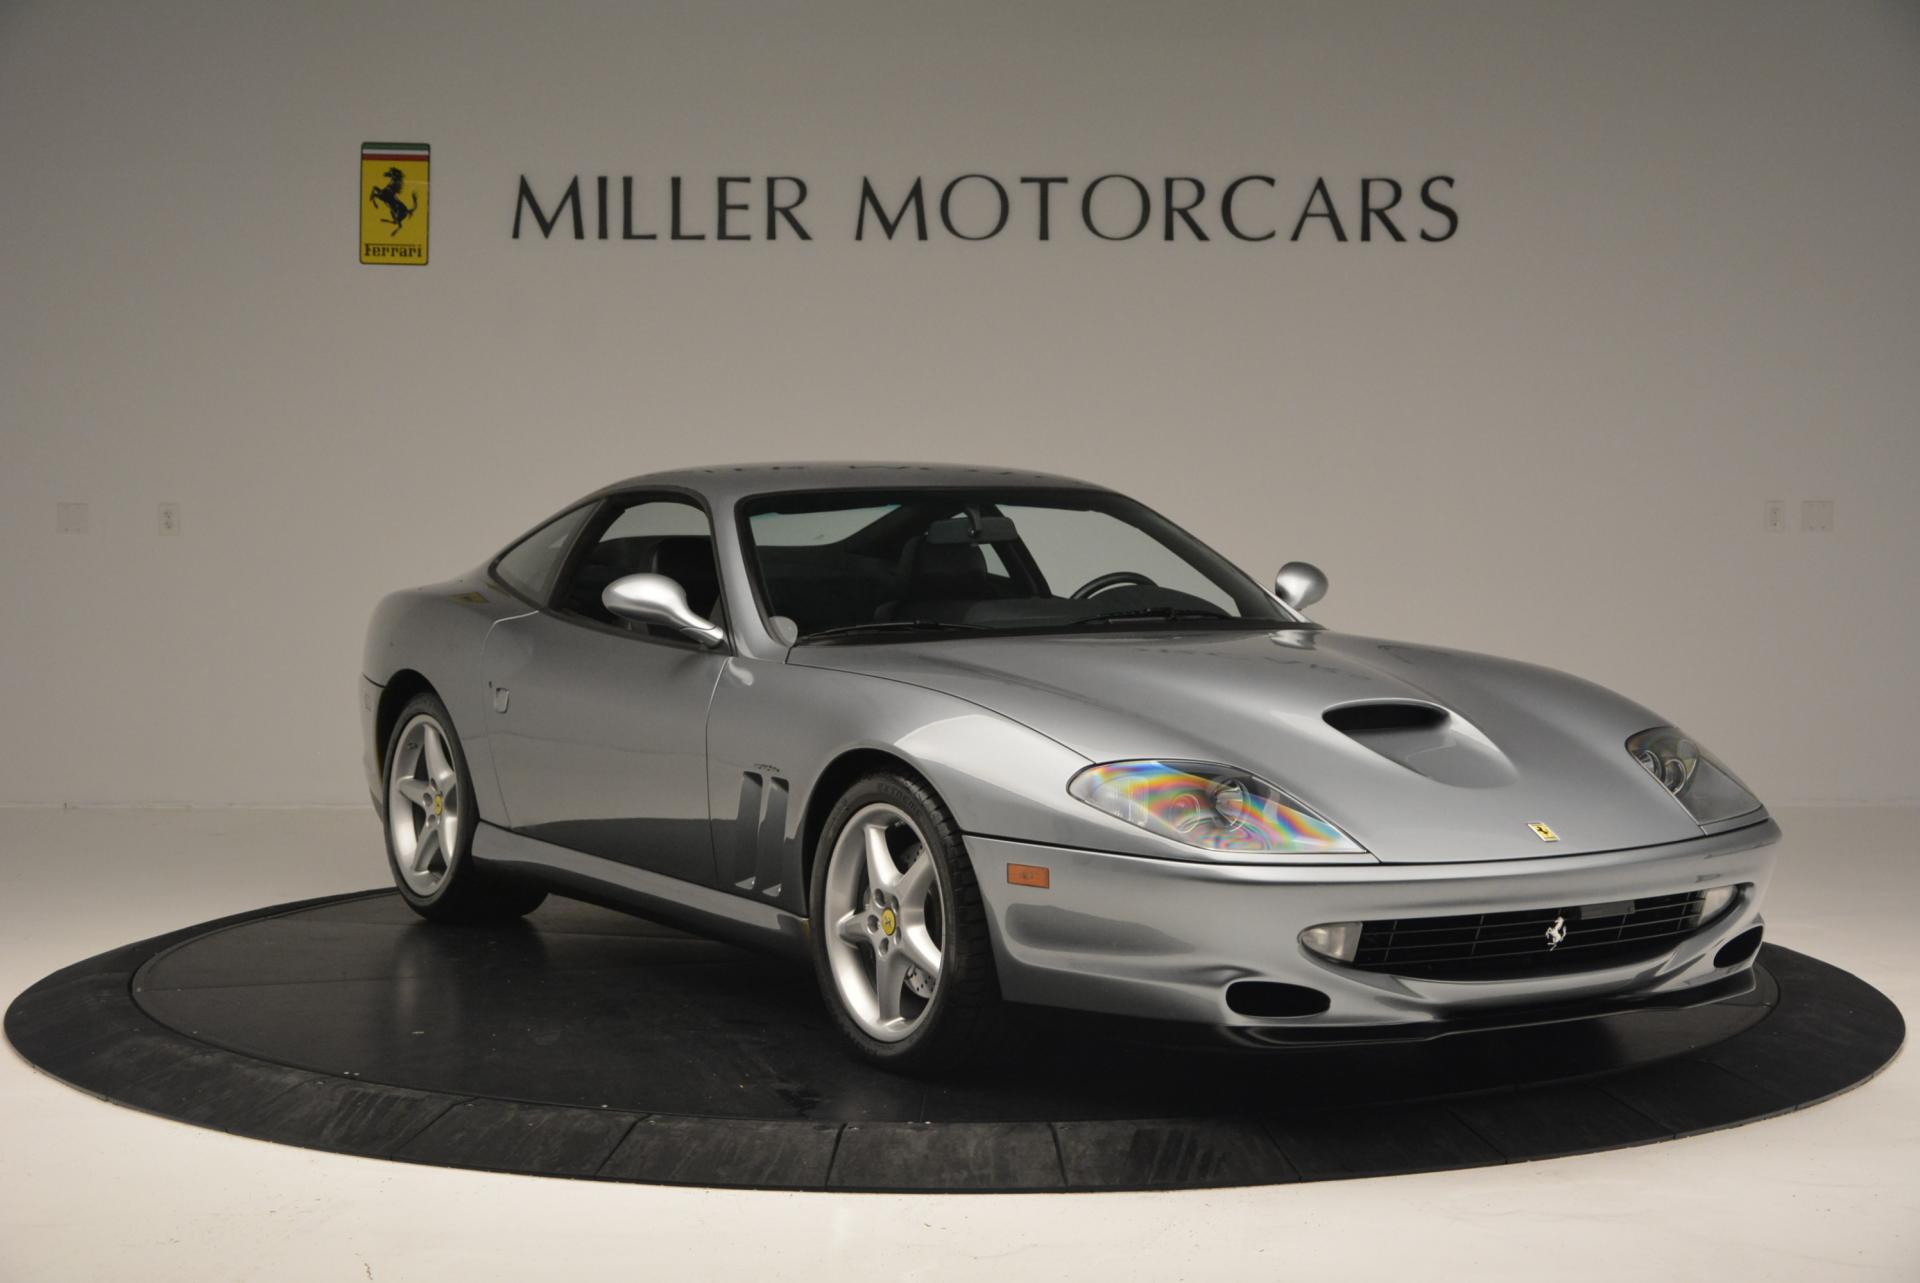 Used 1997 Ferrari 550 Maranello  For Sale In Westport, CT 147_p11